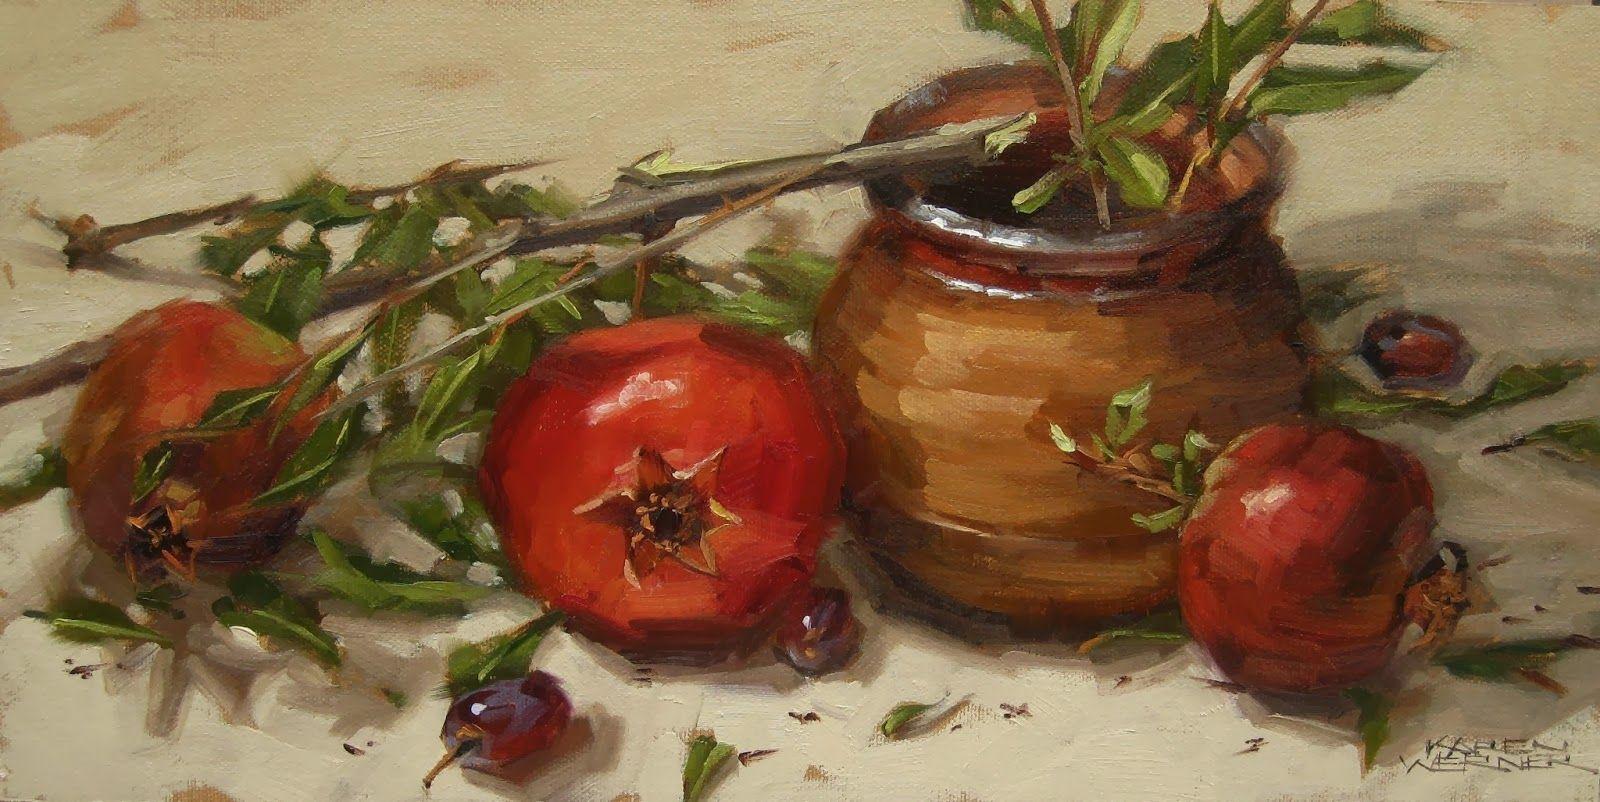 pomegranate tree - Google'da Ara